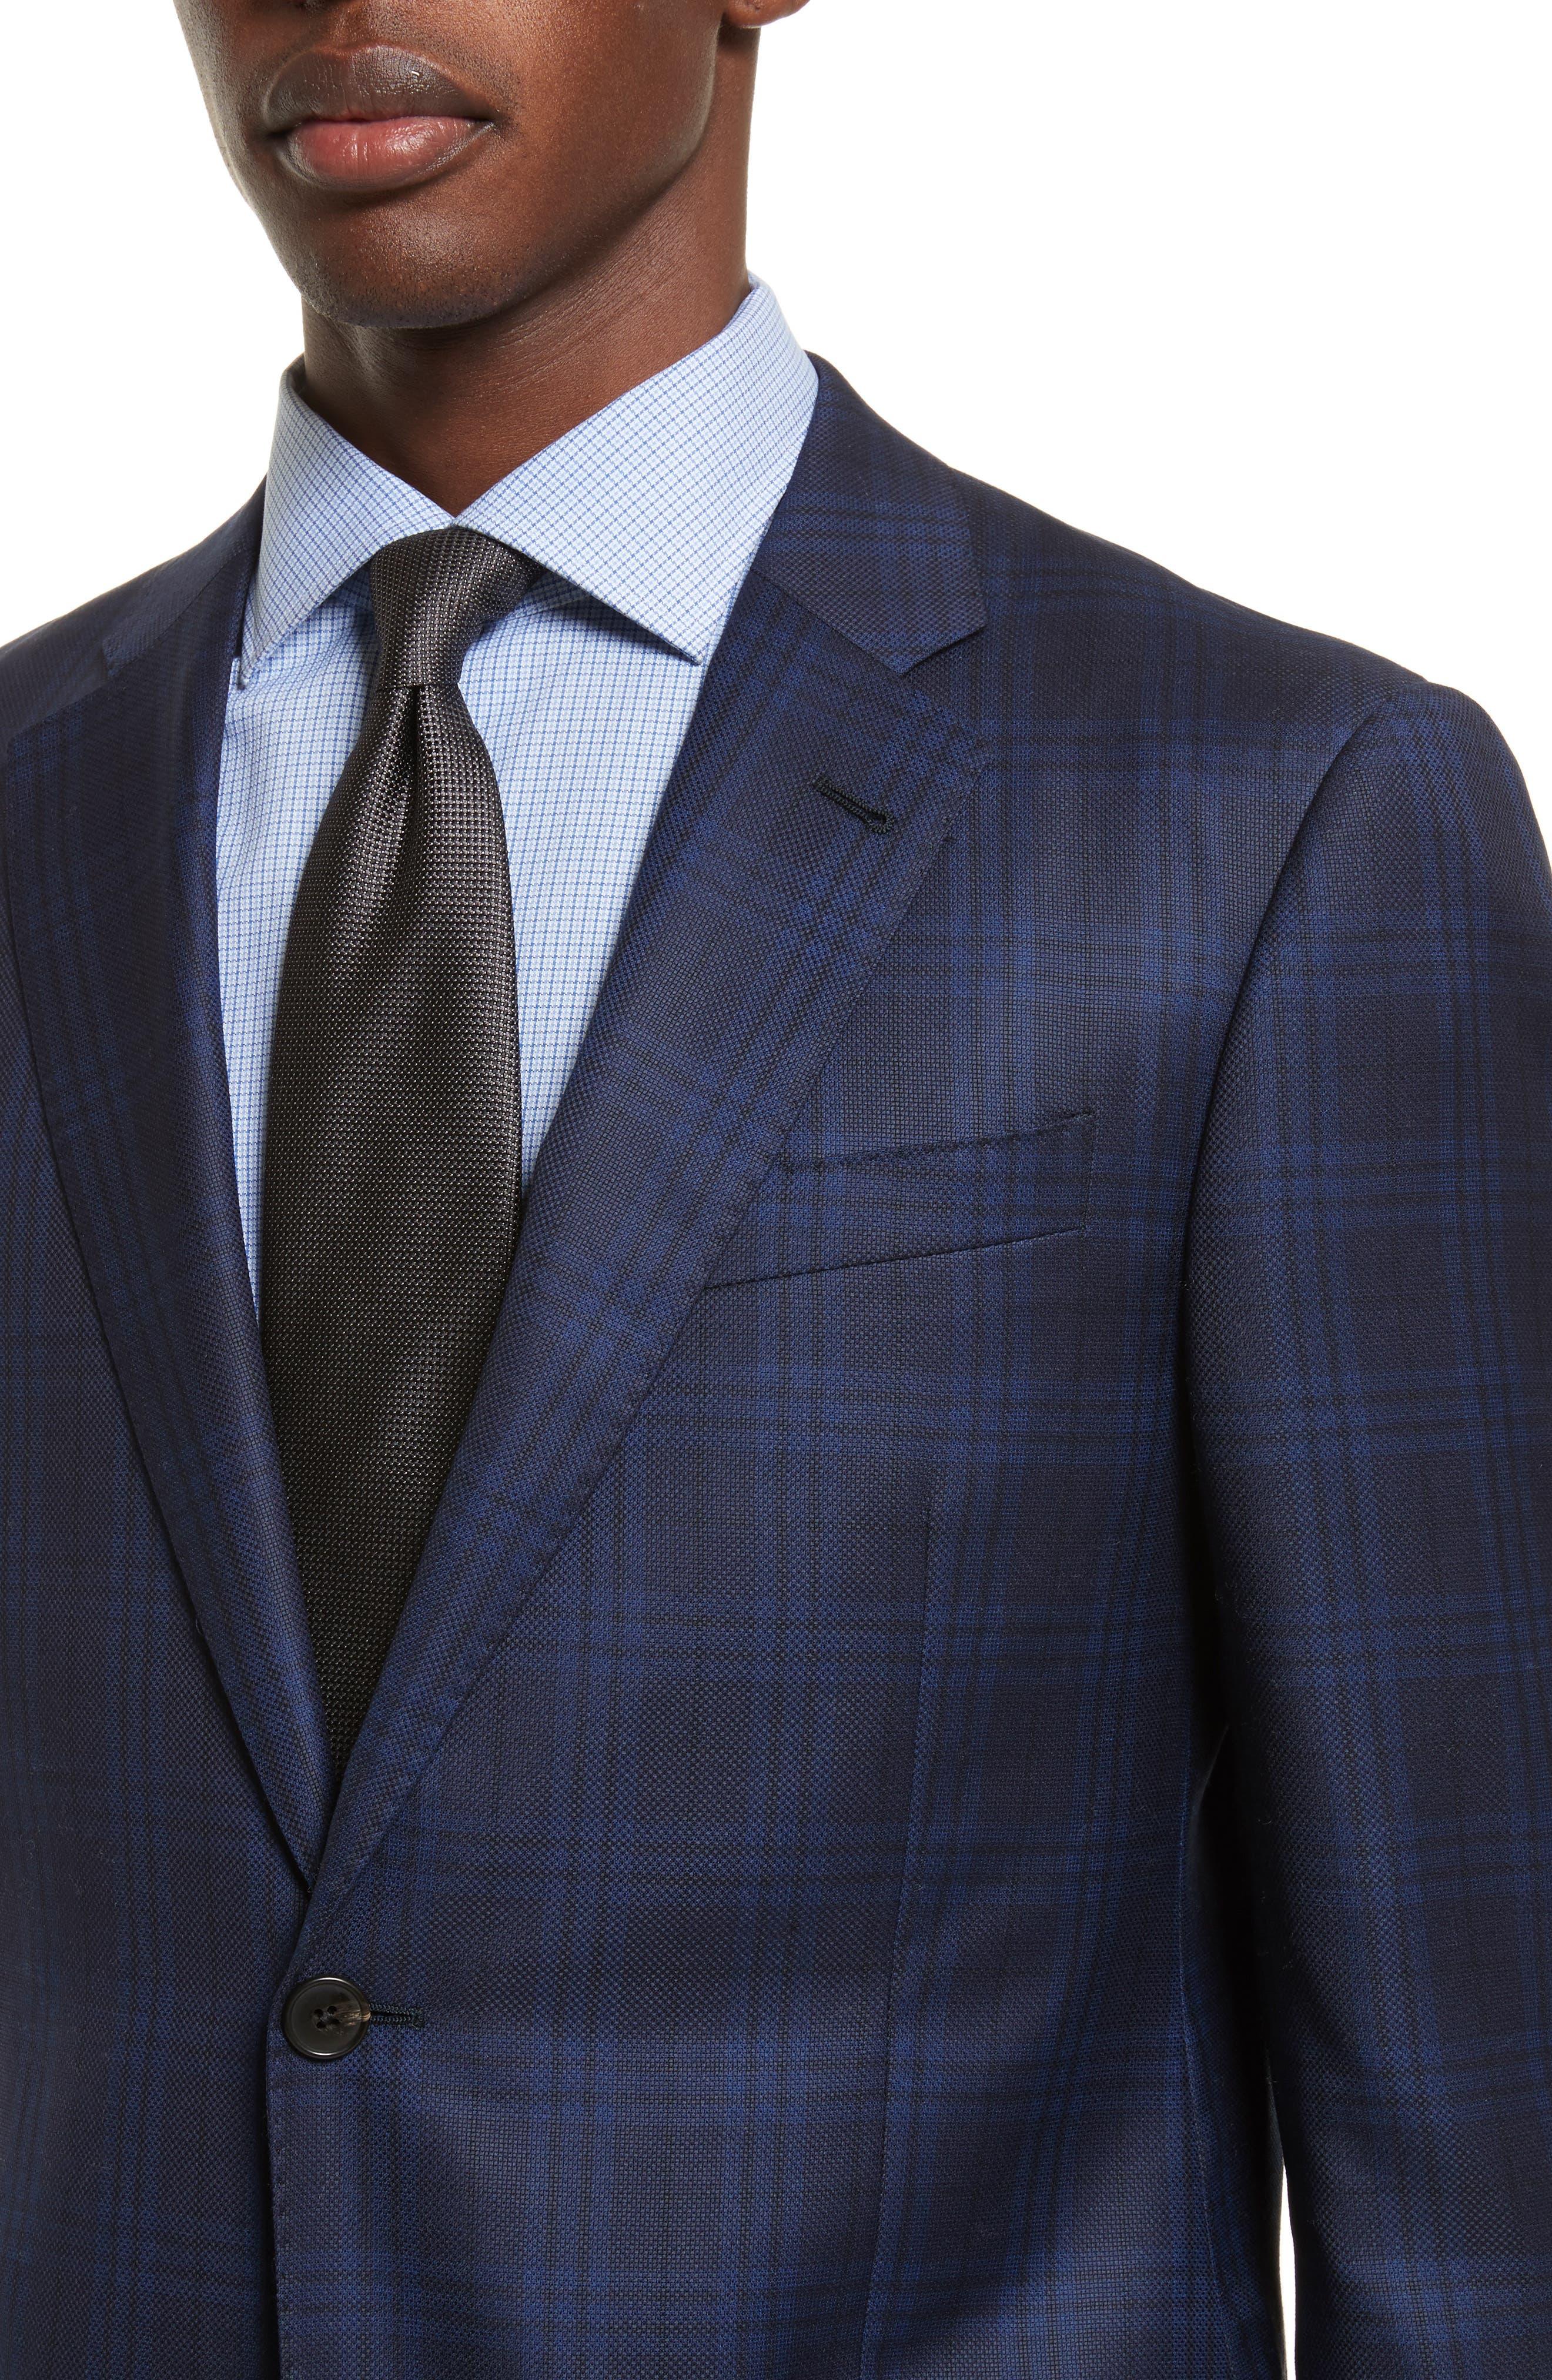 G-Line Trim Fit Houndstooth Wool Sport Coat,                             Alternate thumbnail 4, color,                             410